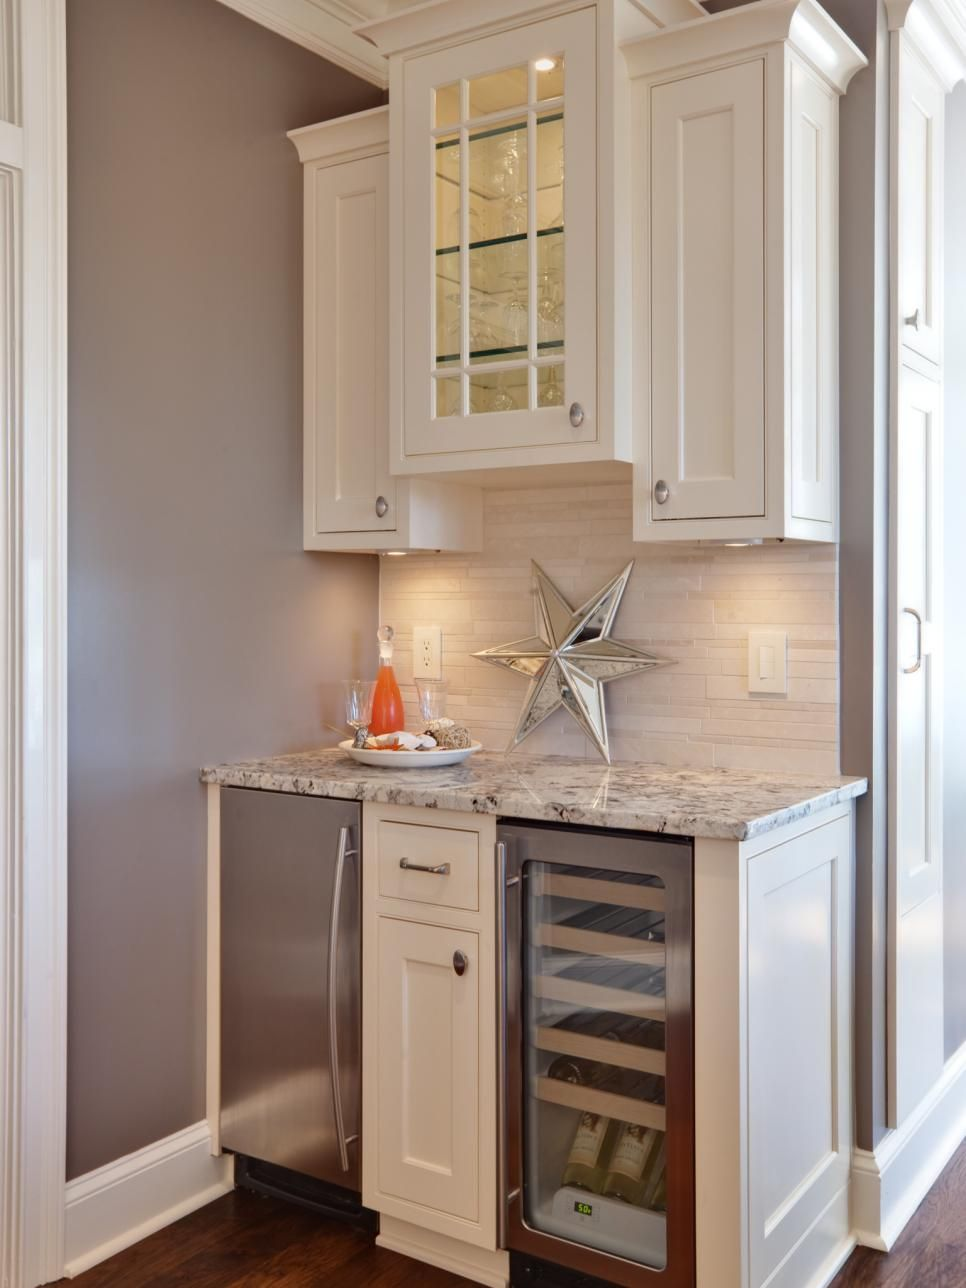 Best Kitchen Gallery: 15 Stylish Small Home Bar Ideas Hgtv Small Spaces And Stylish of Small Home Bars Designs  on rachelxblog.com